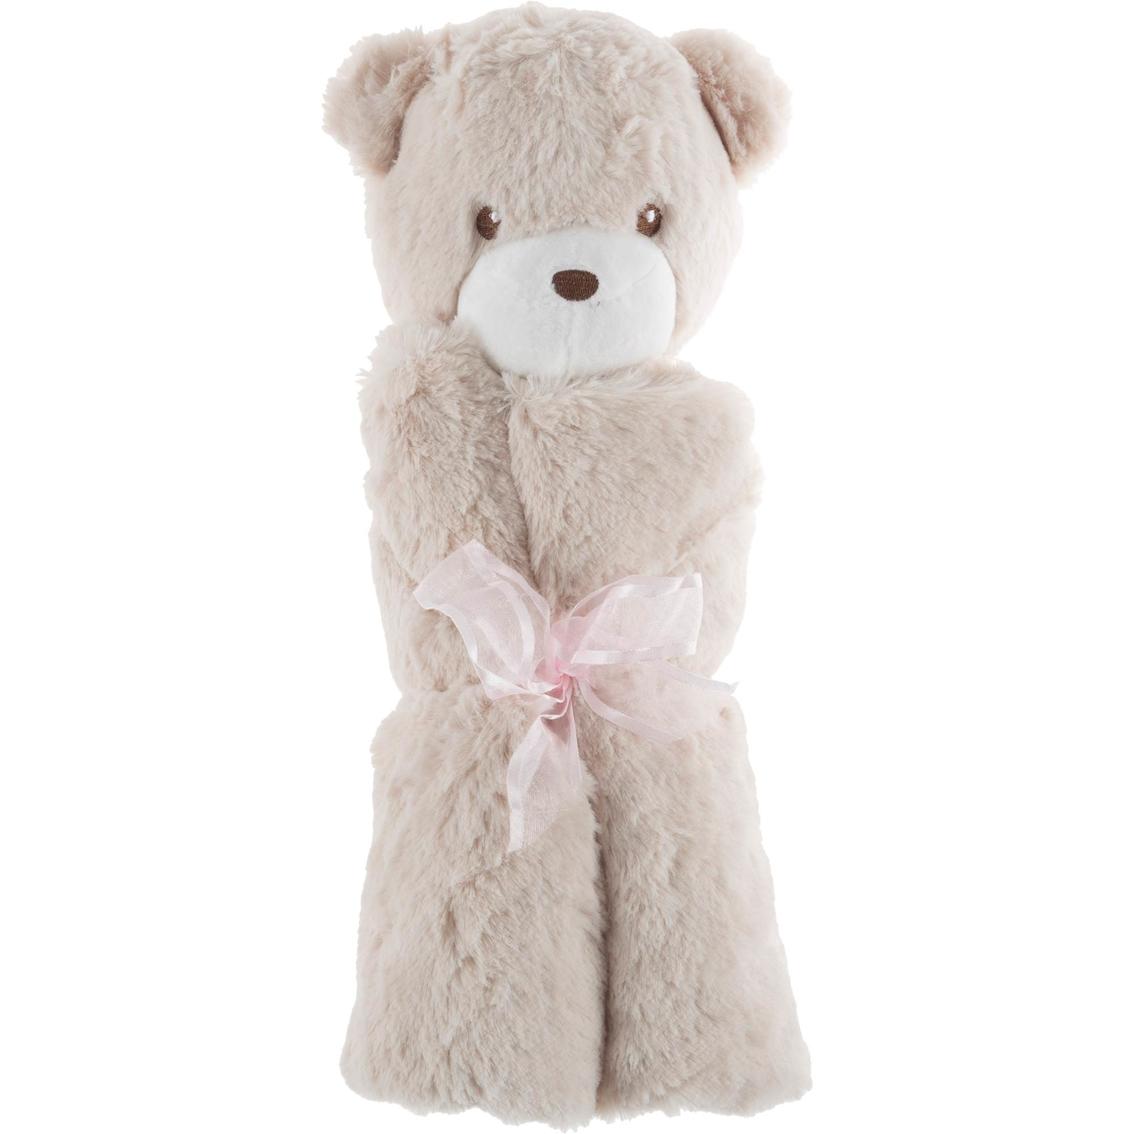 Lavish Home Happy Trails Stuffed Animal Baby Security Blanket